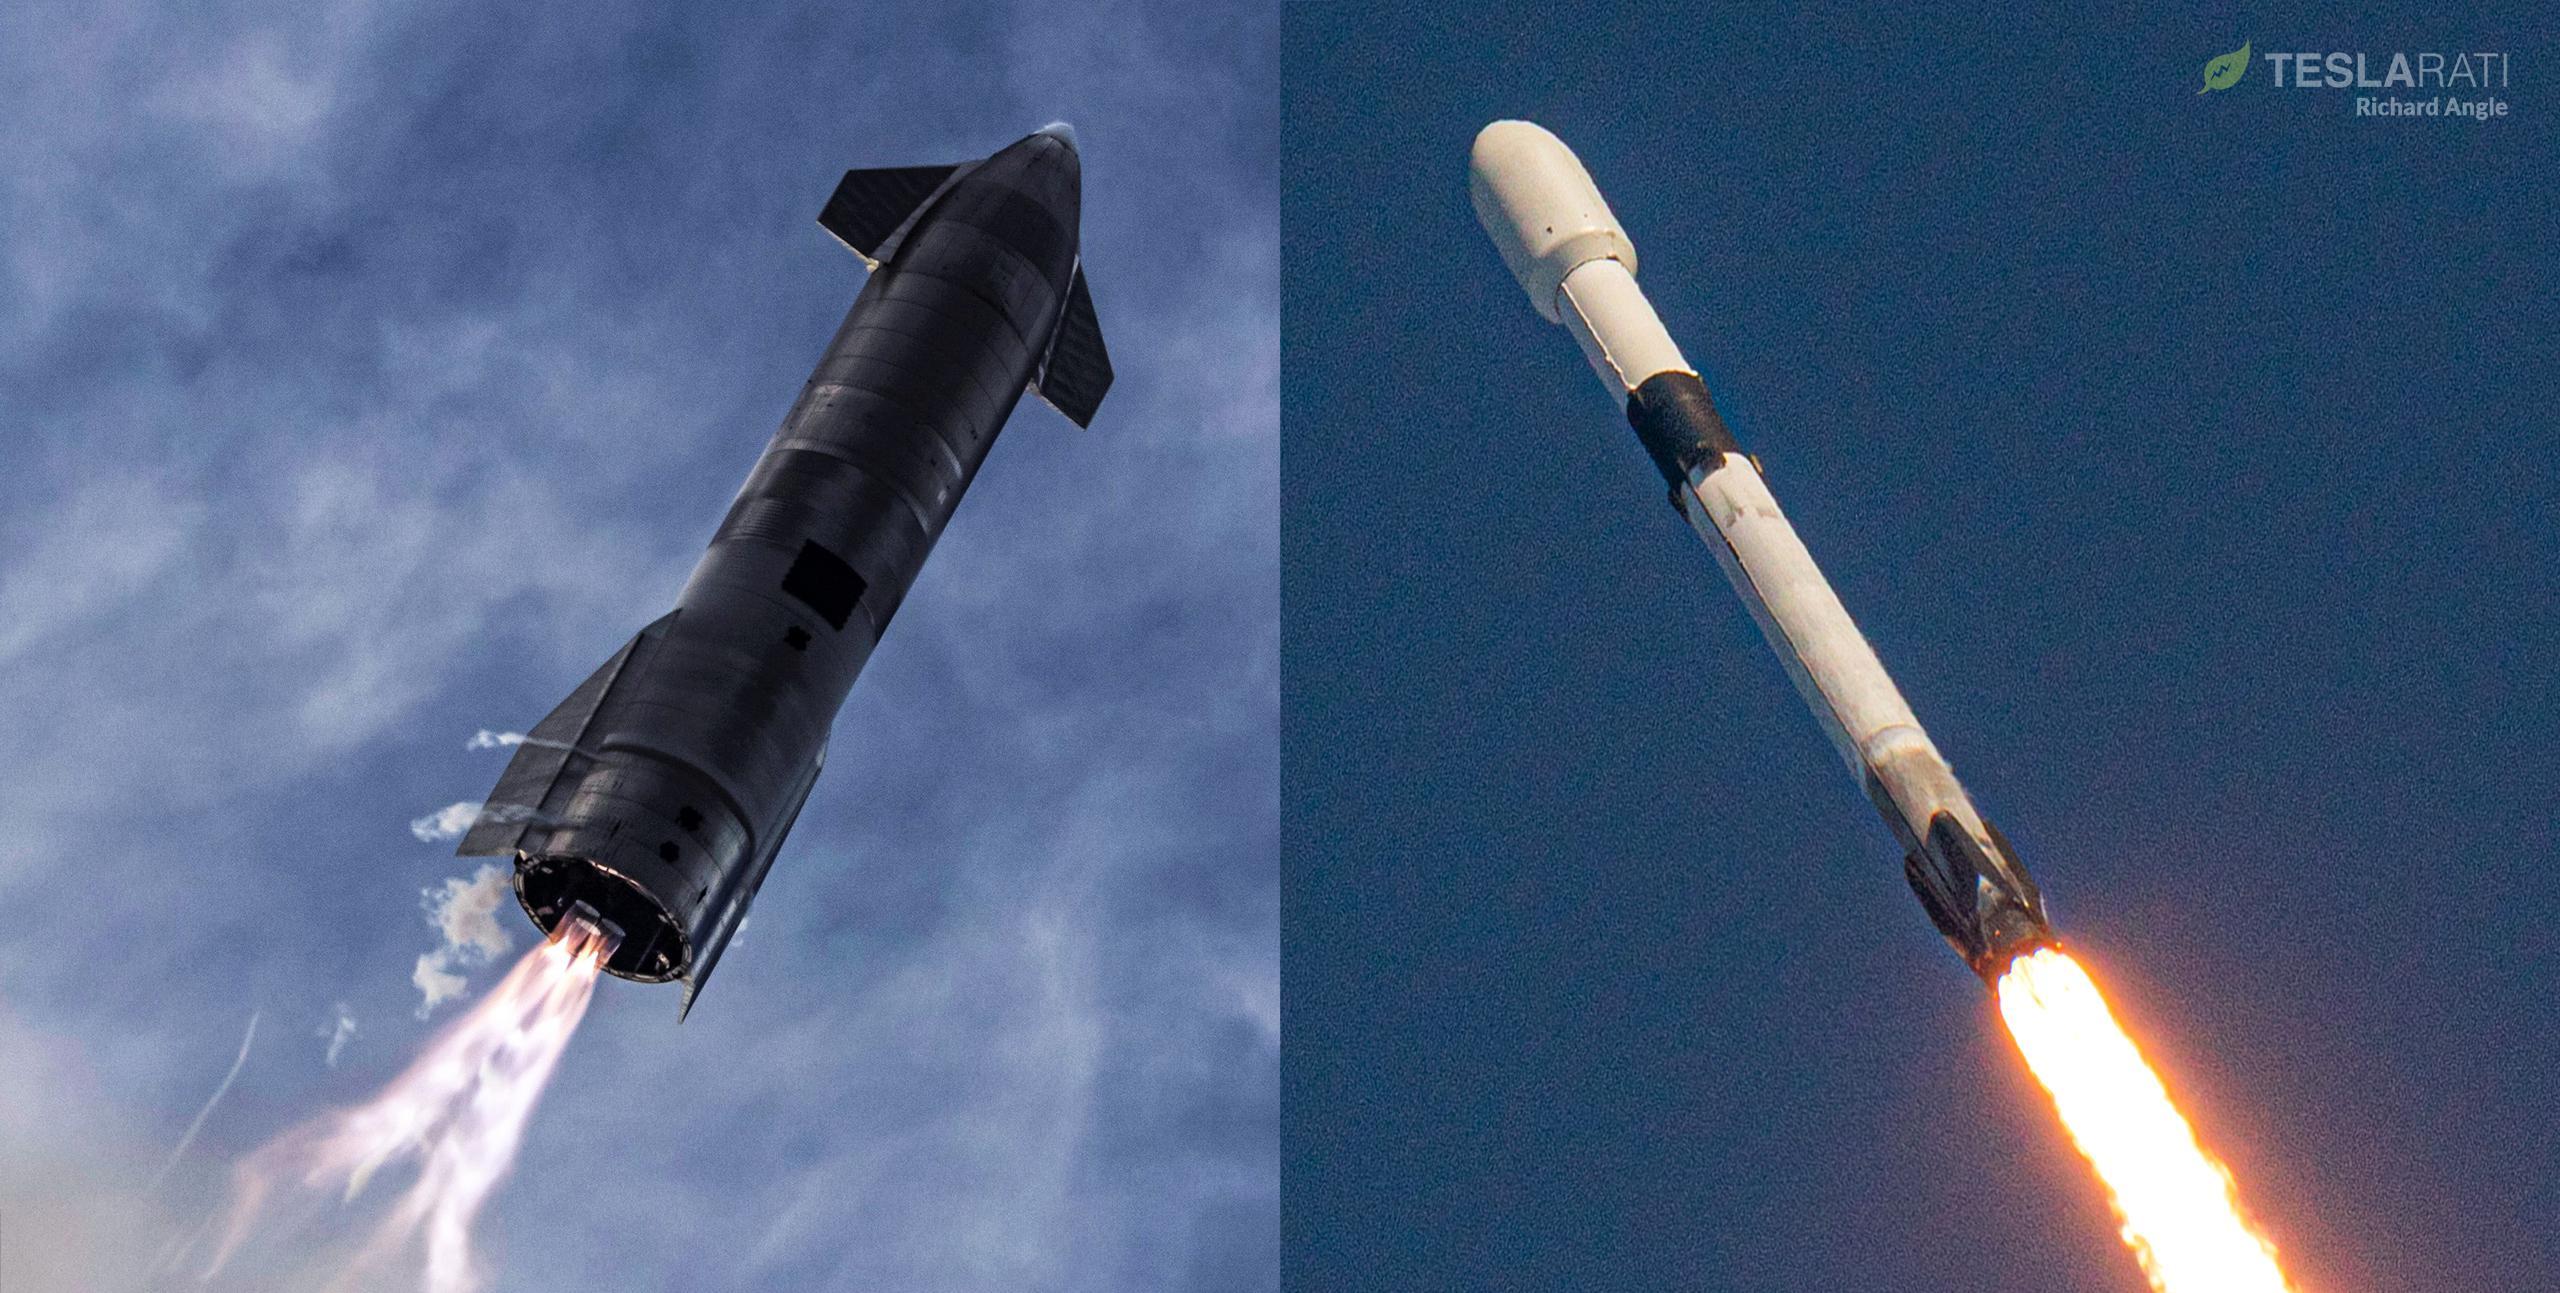 Starship SN10 030221 Starlink-3 012920 (SpaceX – Richard Angle) 1 (c)